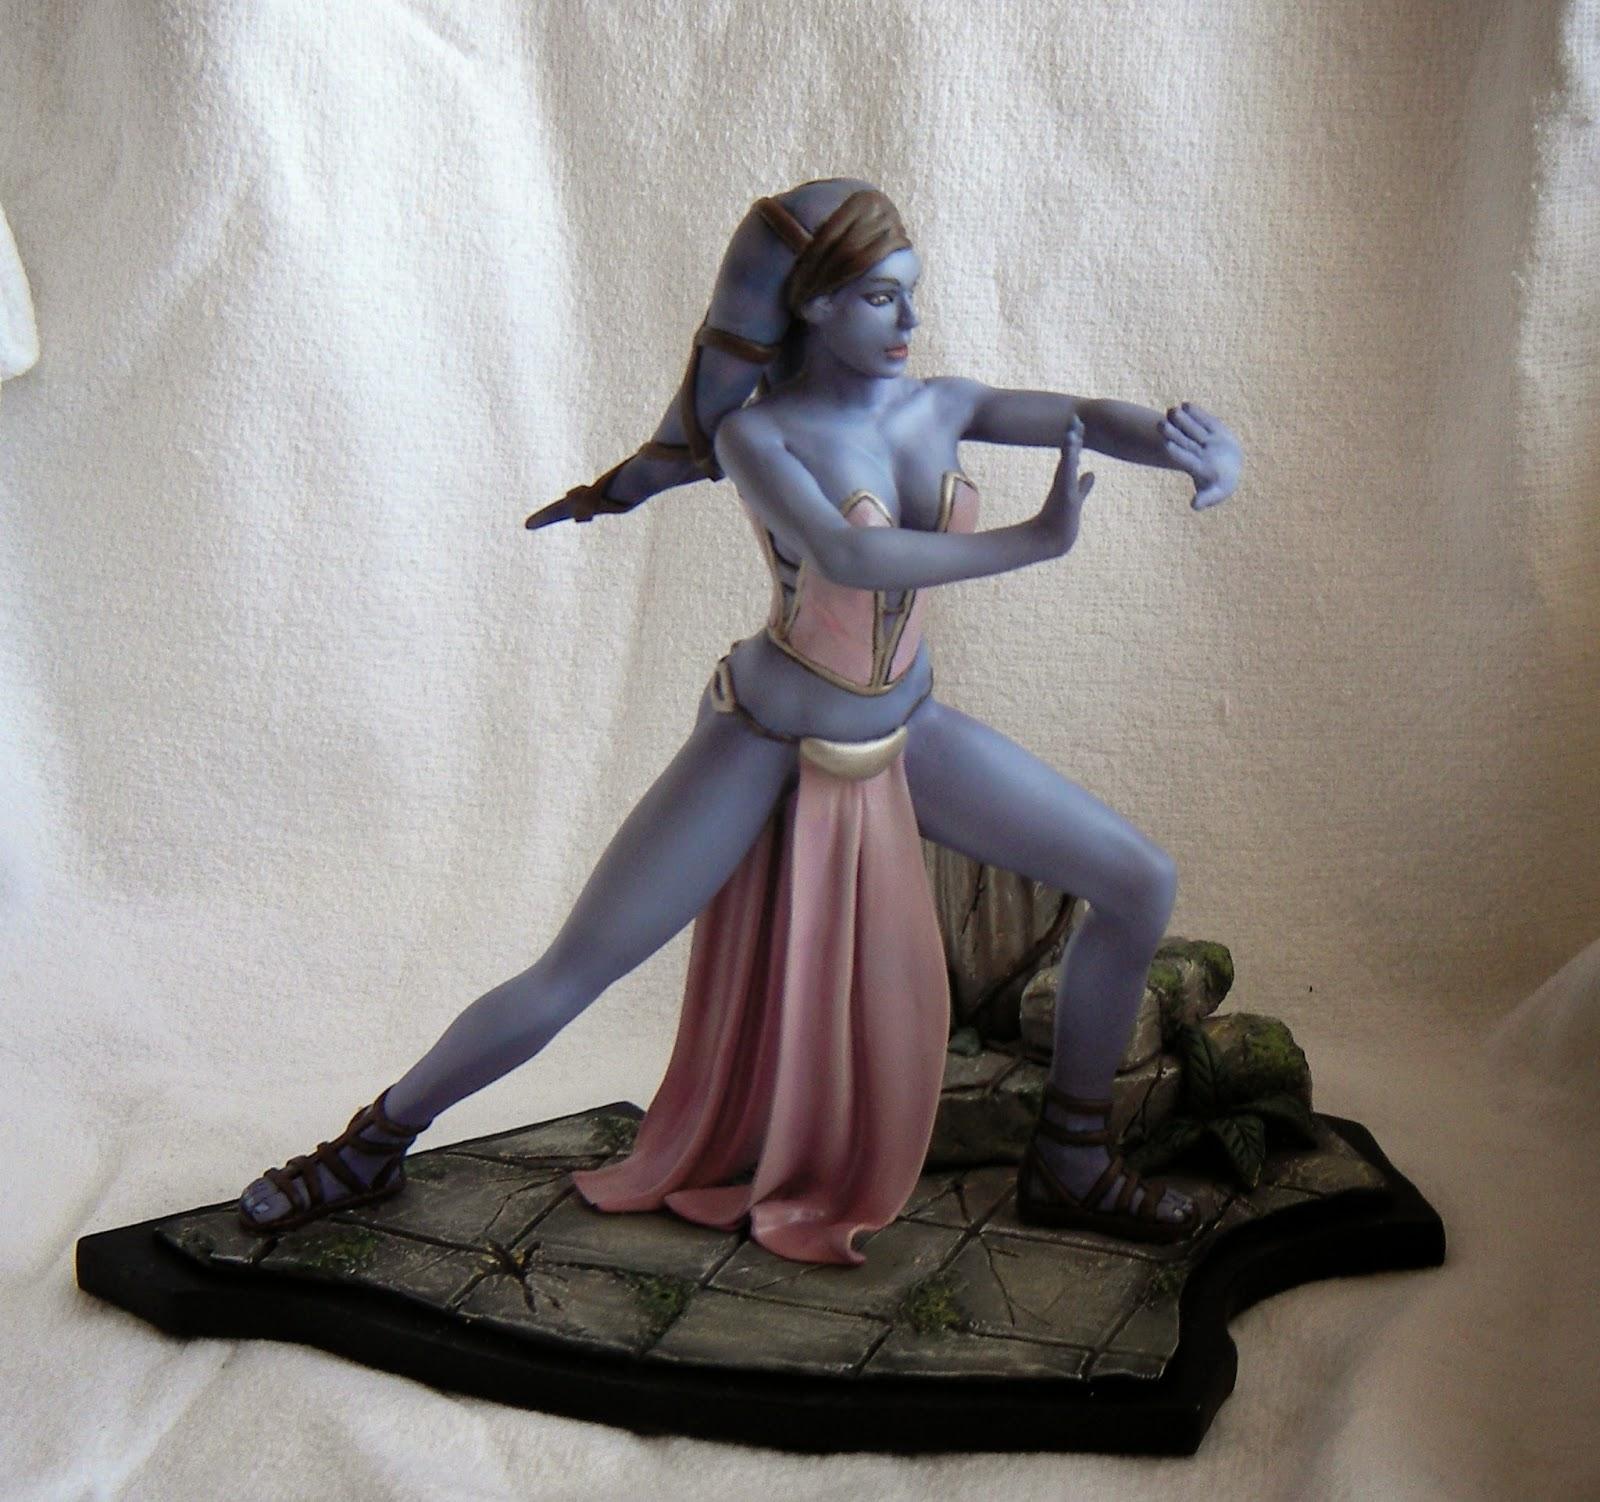 NIMAJNEB SCULPTURE: Aayla Secura statue